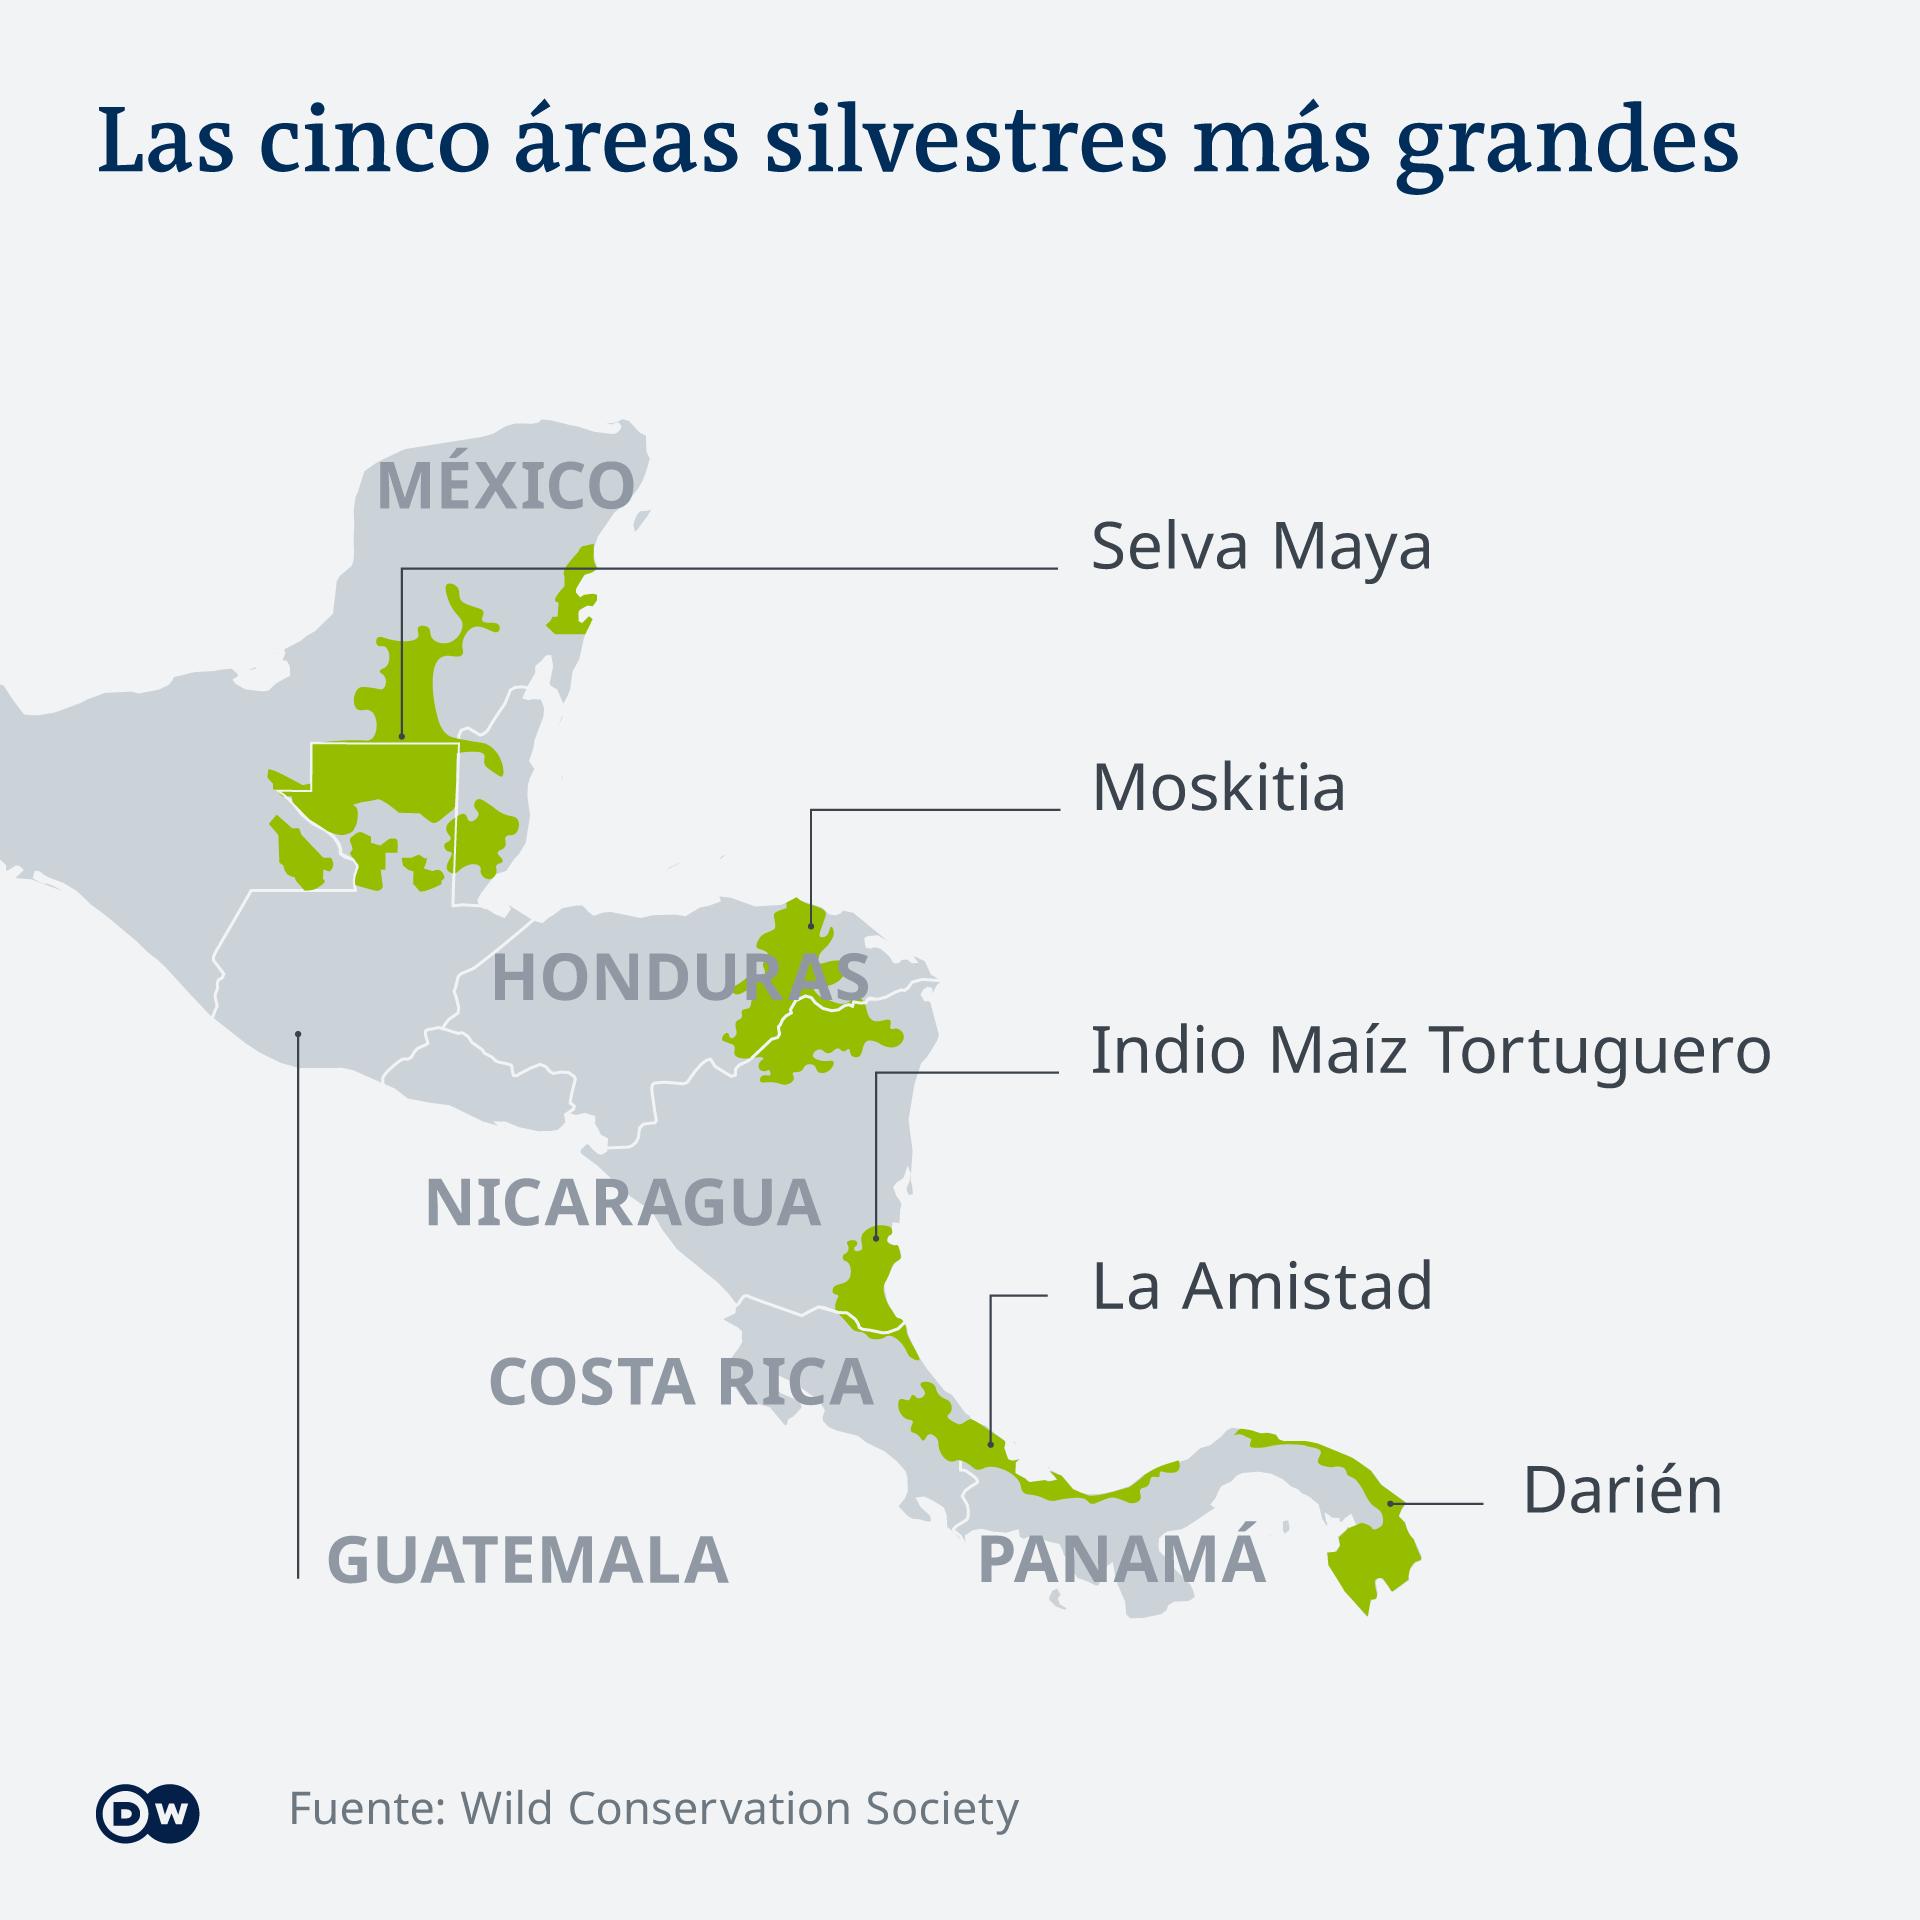 Áreas silvestres más grandes de Mesoamérica - Gráfica DW/WCS